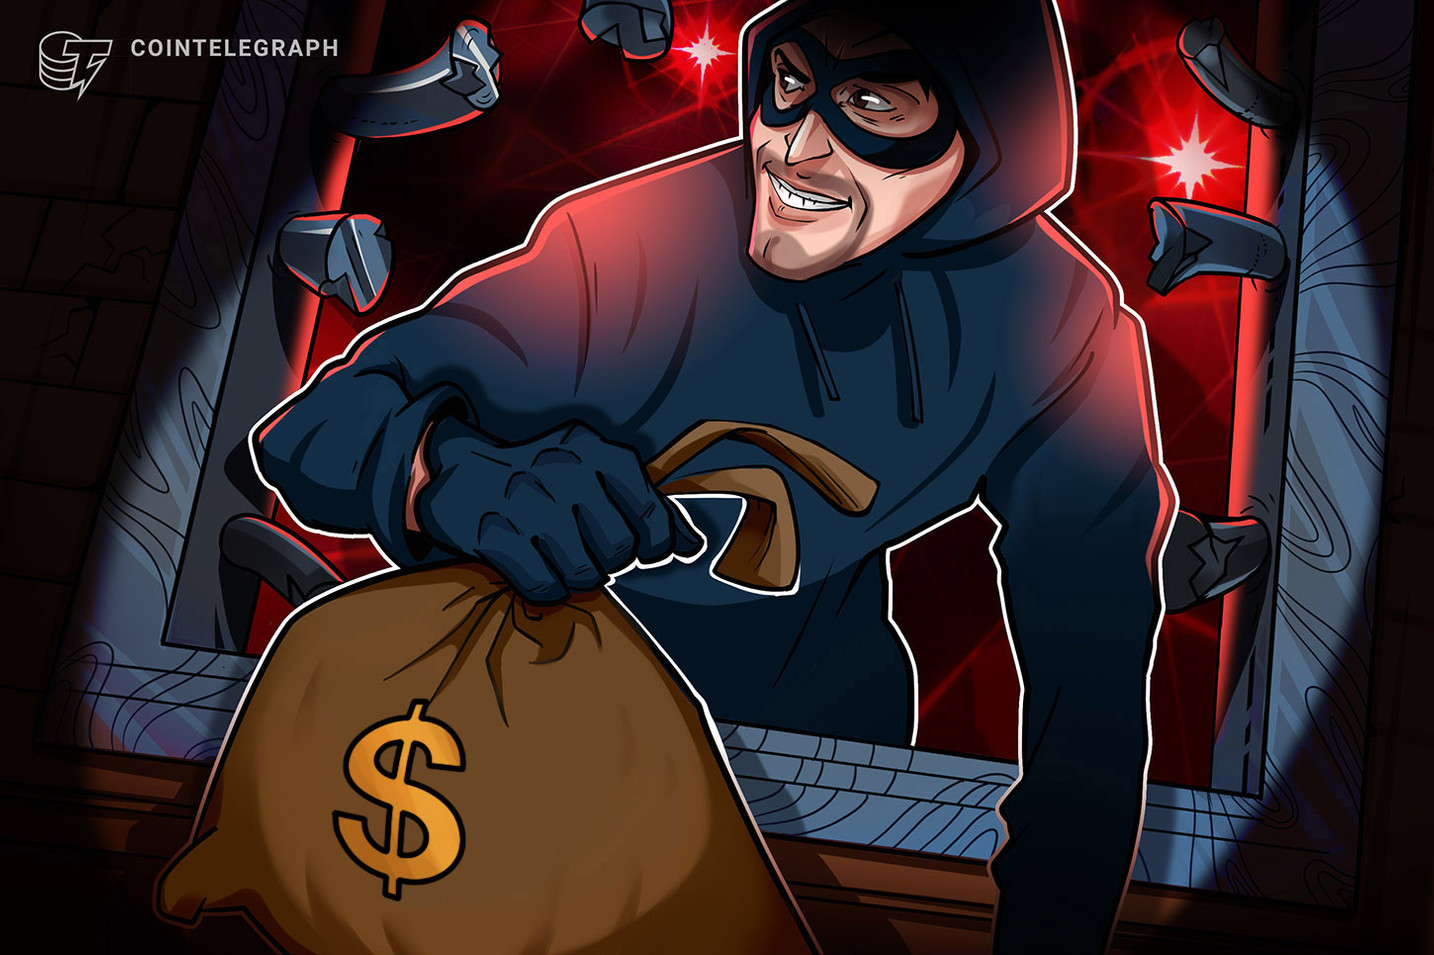 Hacker roba USD 50 millones de la plataforma Uranium Finance